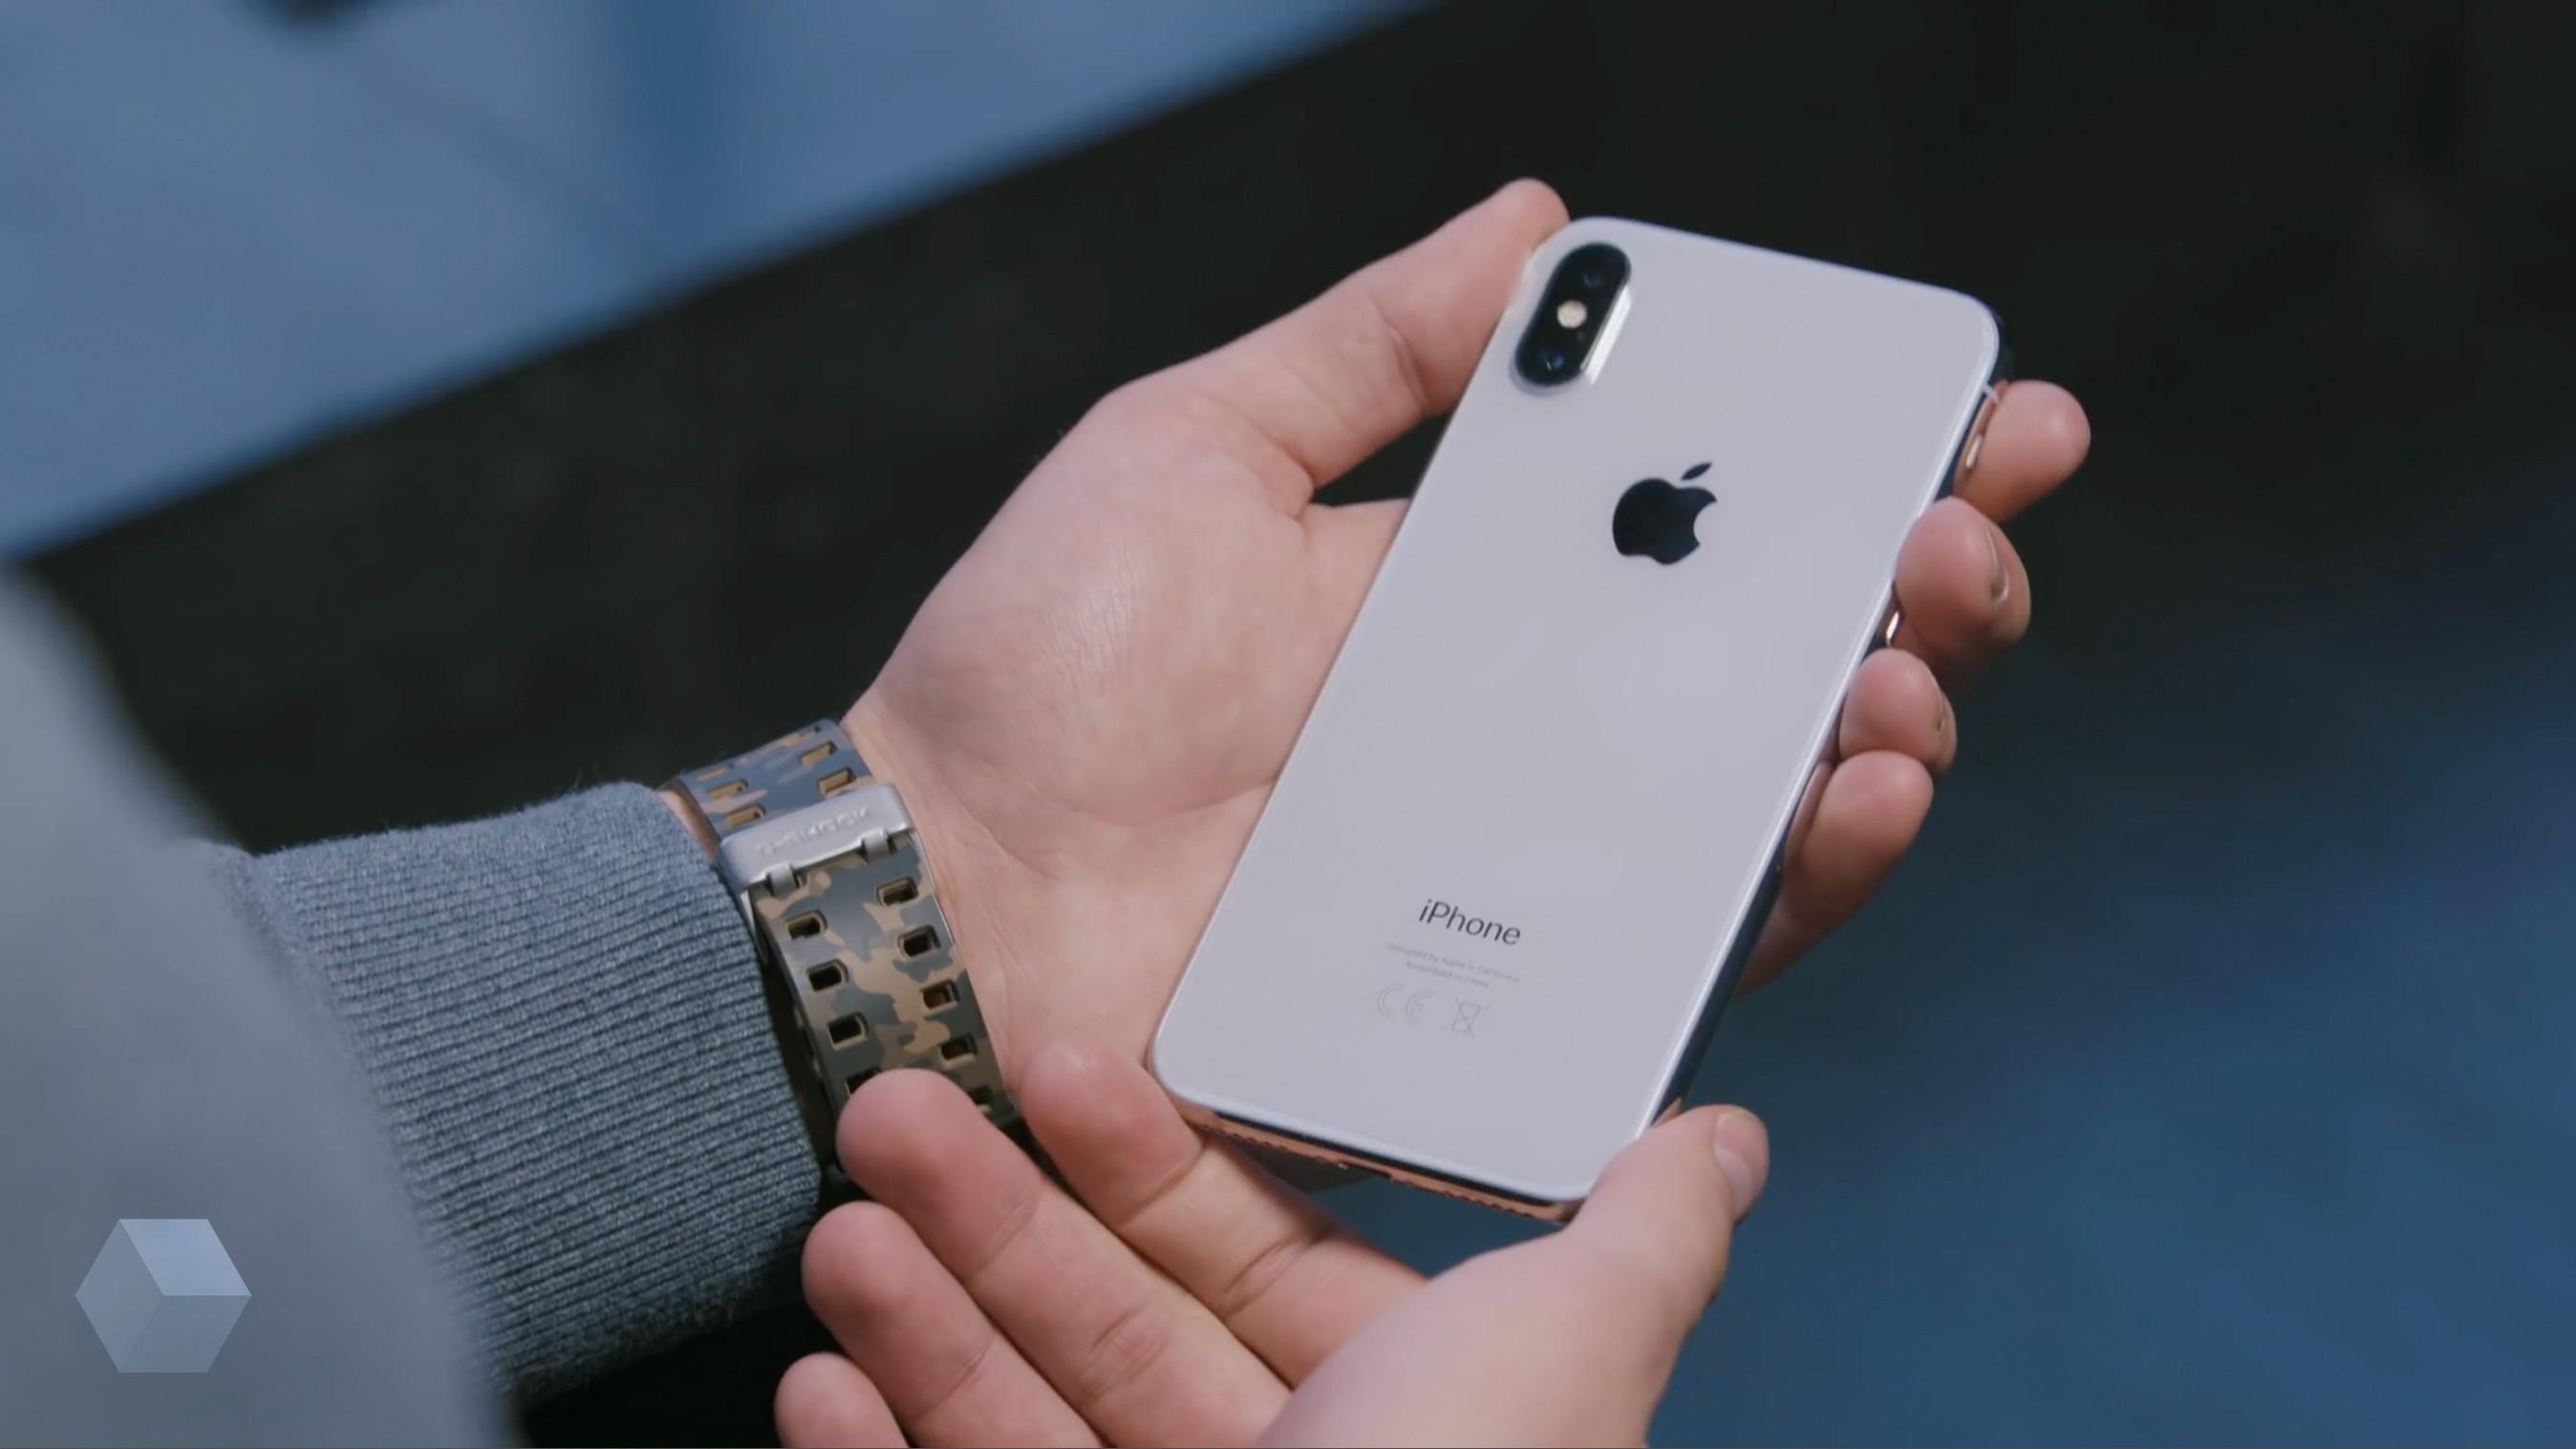 В YouTube появилась поддержка HDR-видео для iPhone X